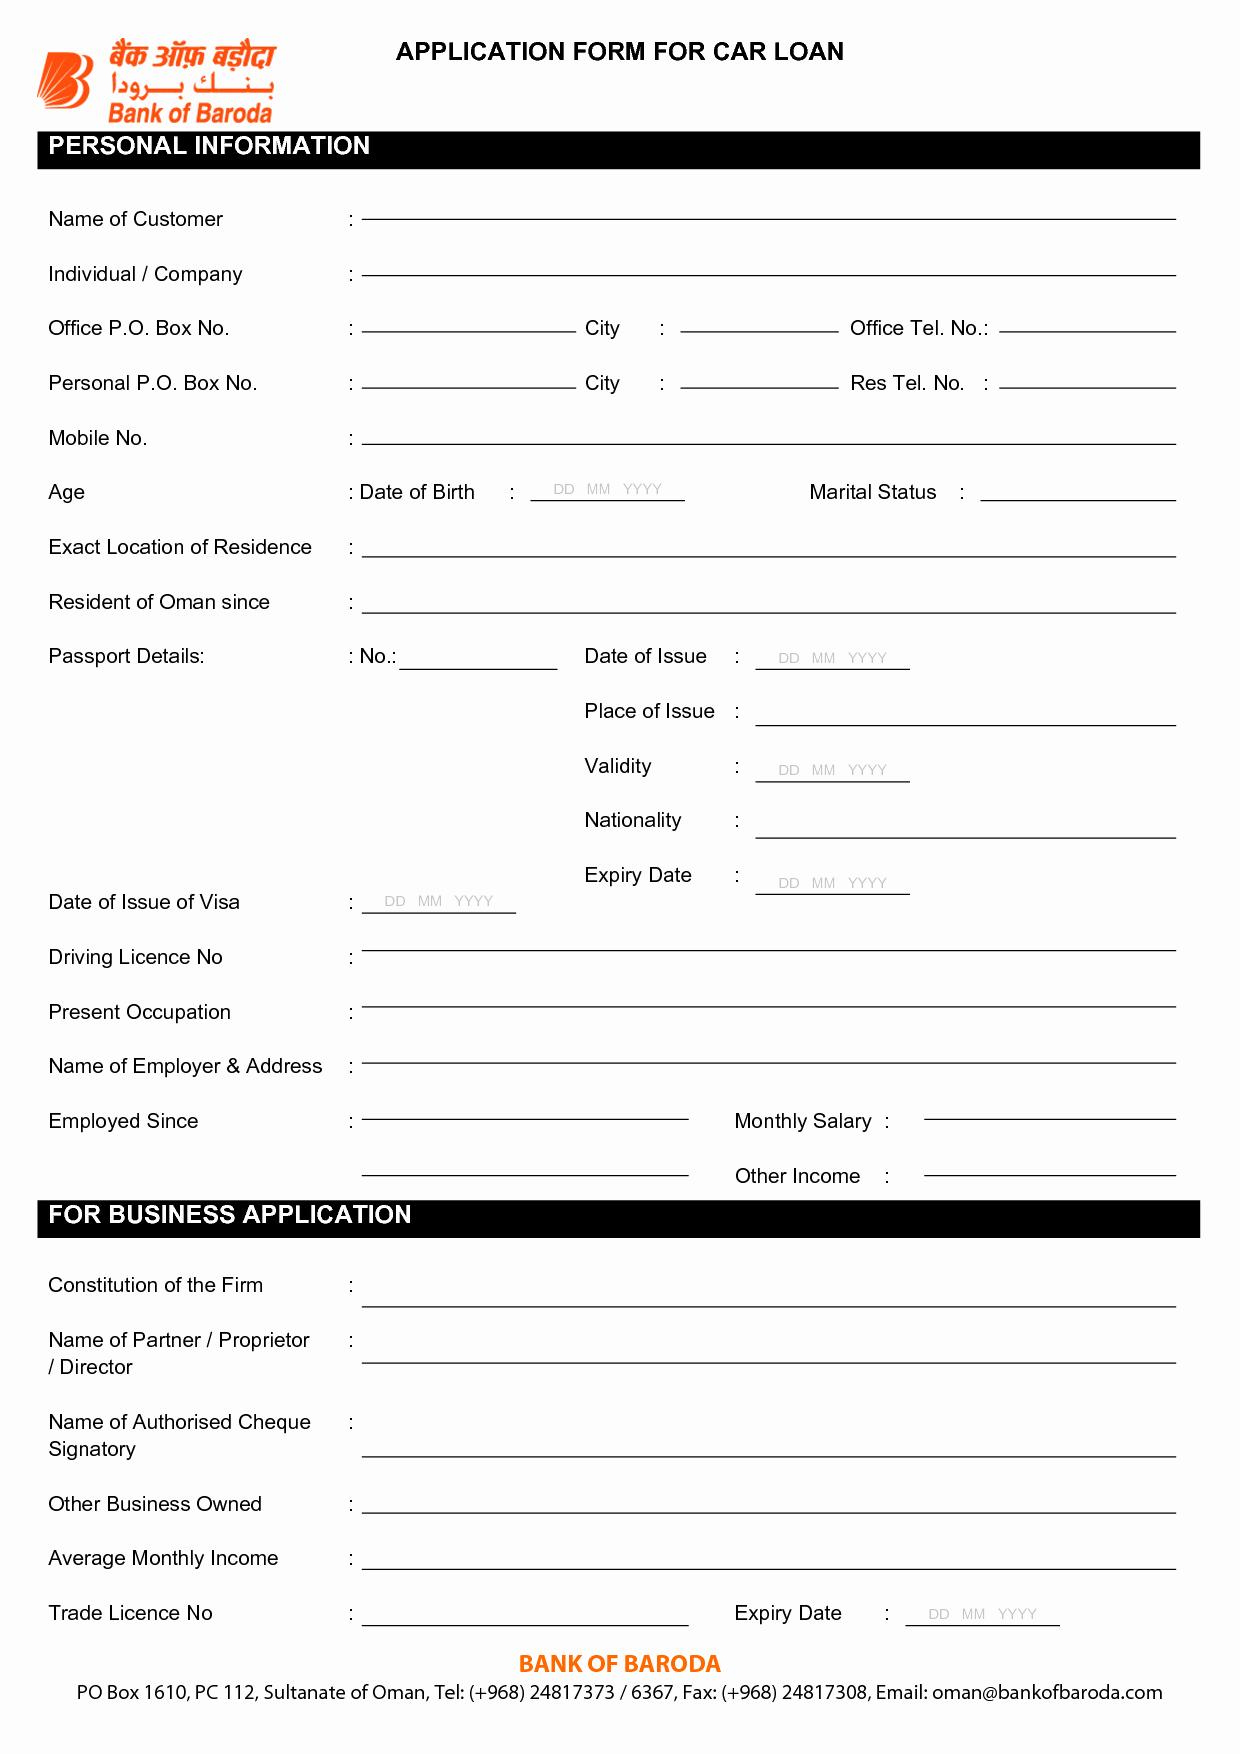 Auto Credit Application form Template Elegant Car Finance for Bad Credit Leeds